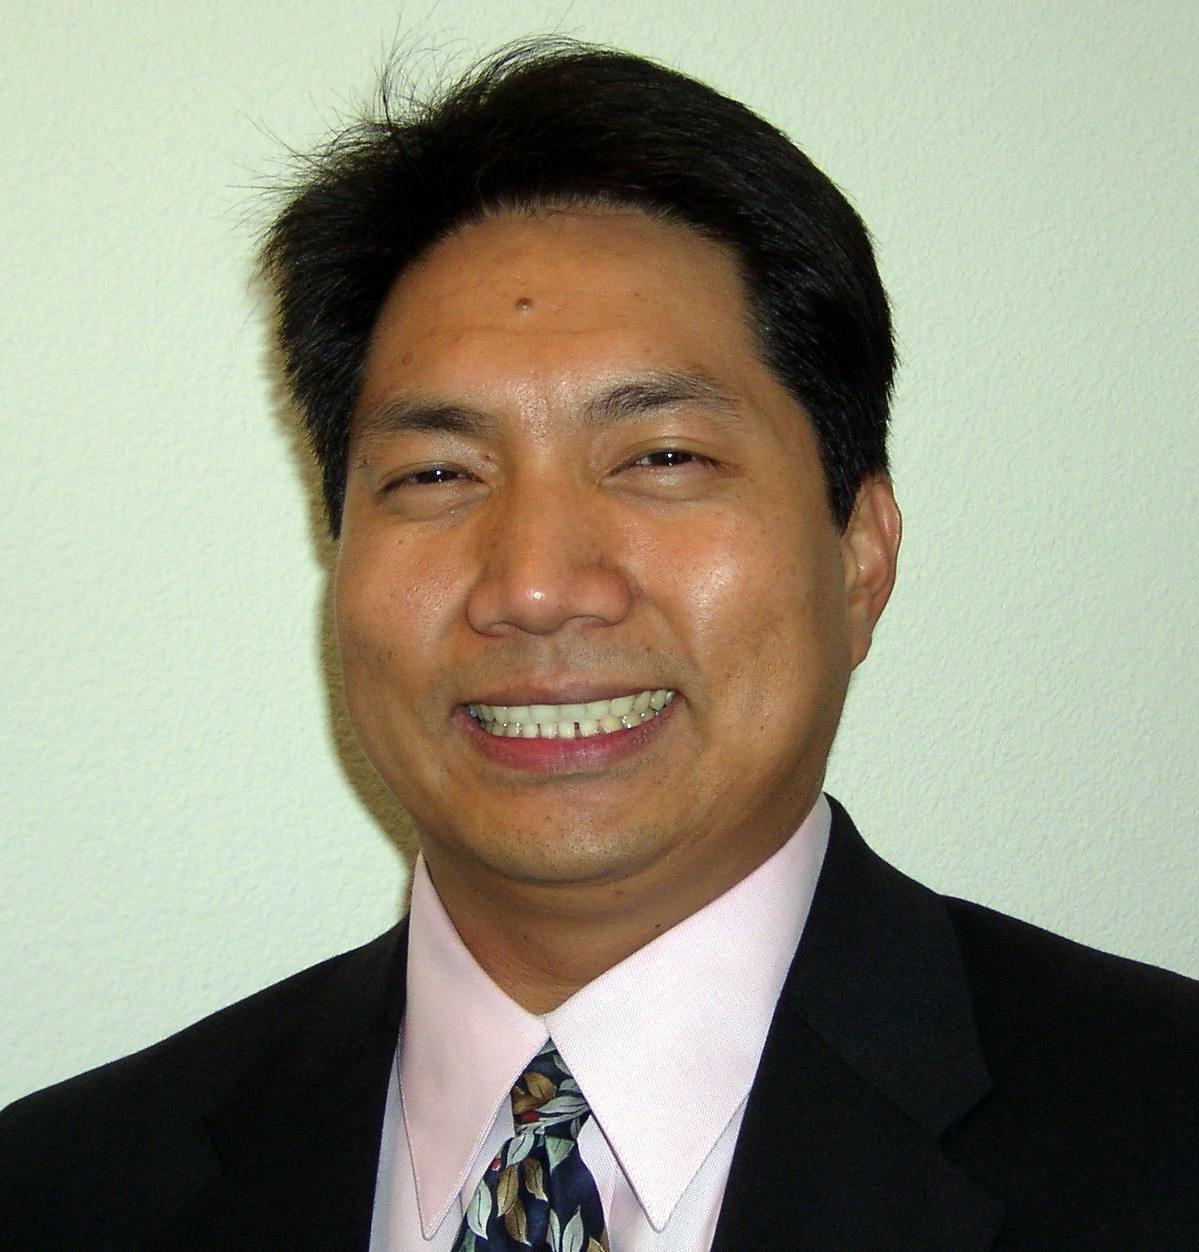 B.j. Ocampo